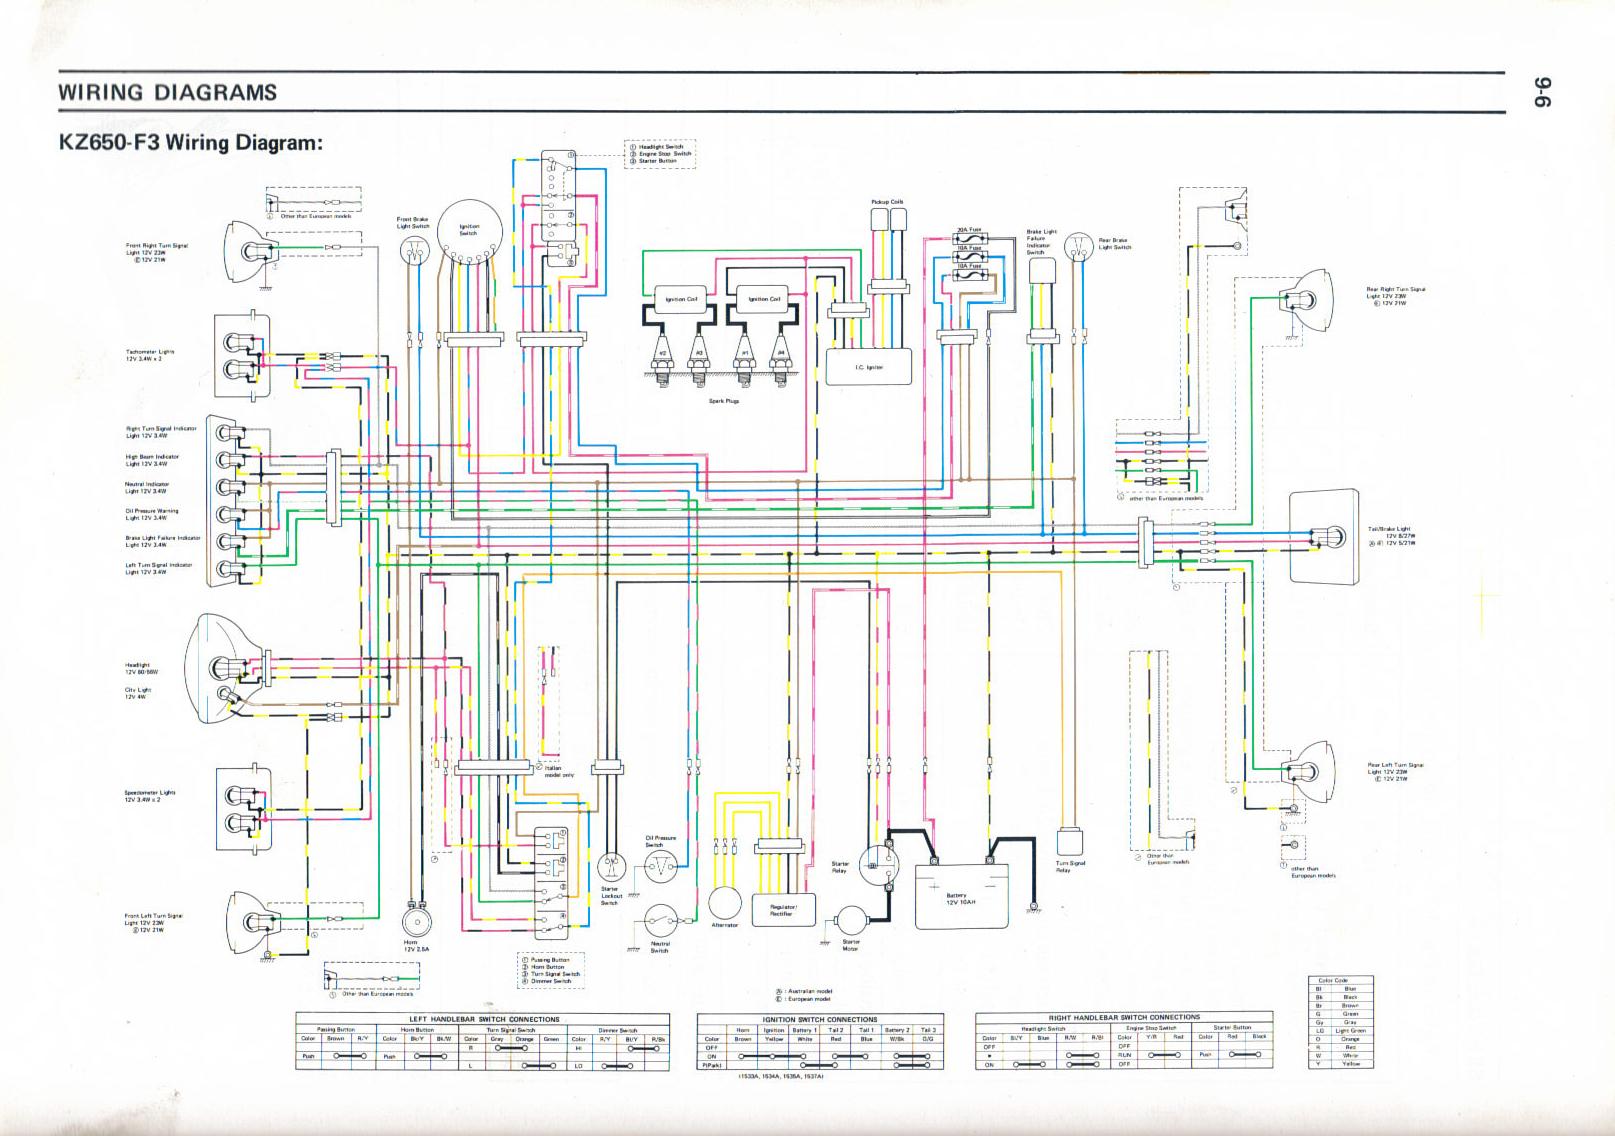 kawasaki z650 kz650 colour wiring loom diagrams wiring diagram77 kz650 wiring diagram schematic wiring diagram experts kawasaki z650 kz650 colour wiring loom diagrams